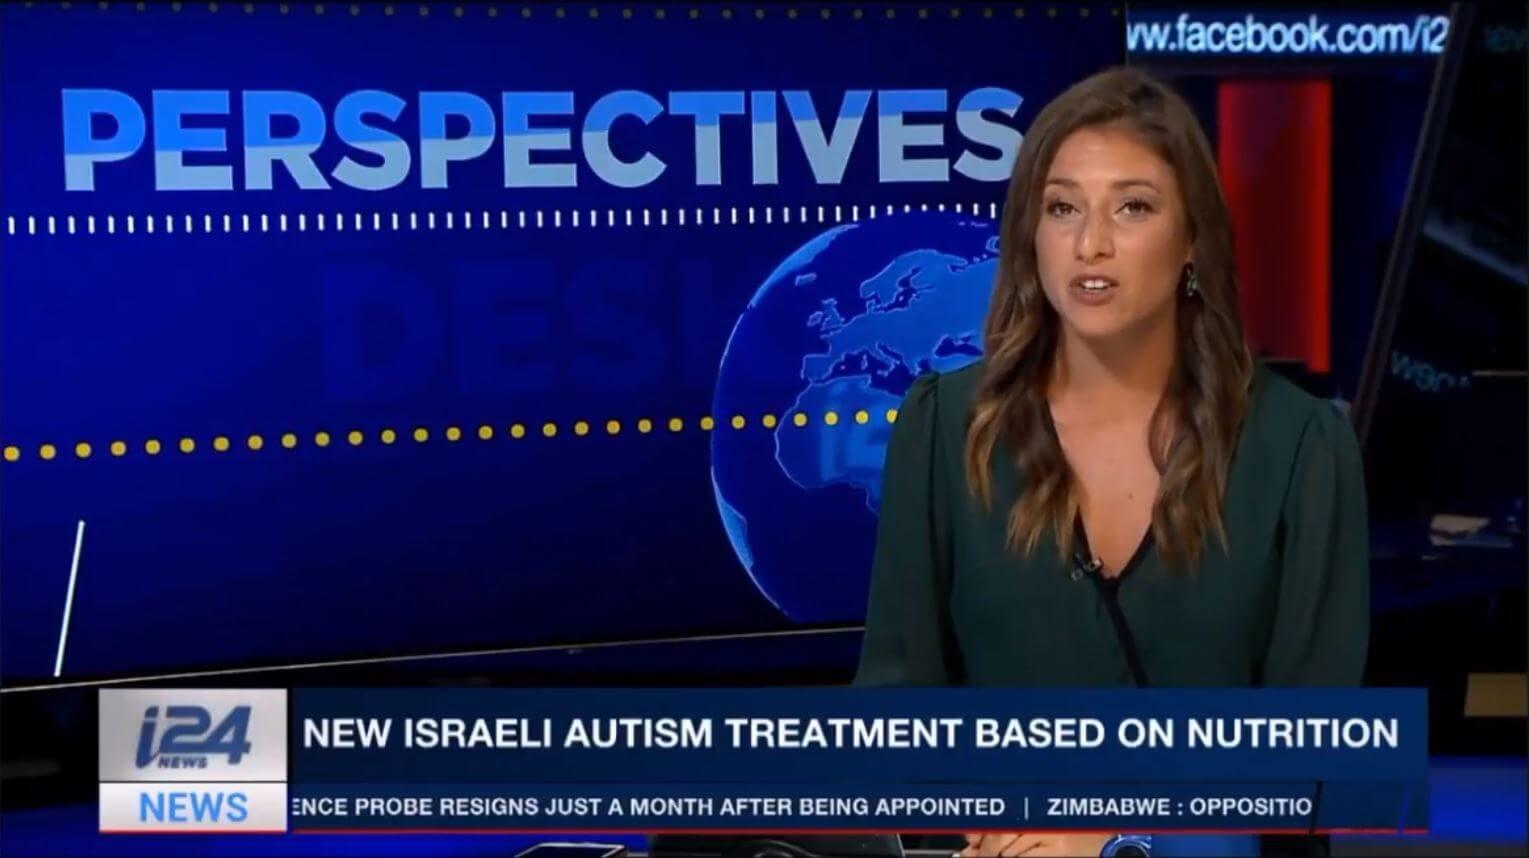 C.A.T U.S i24News news